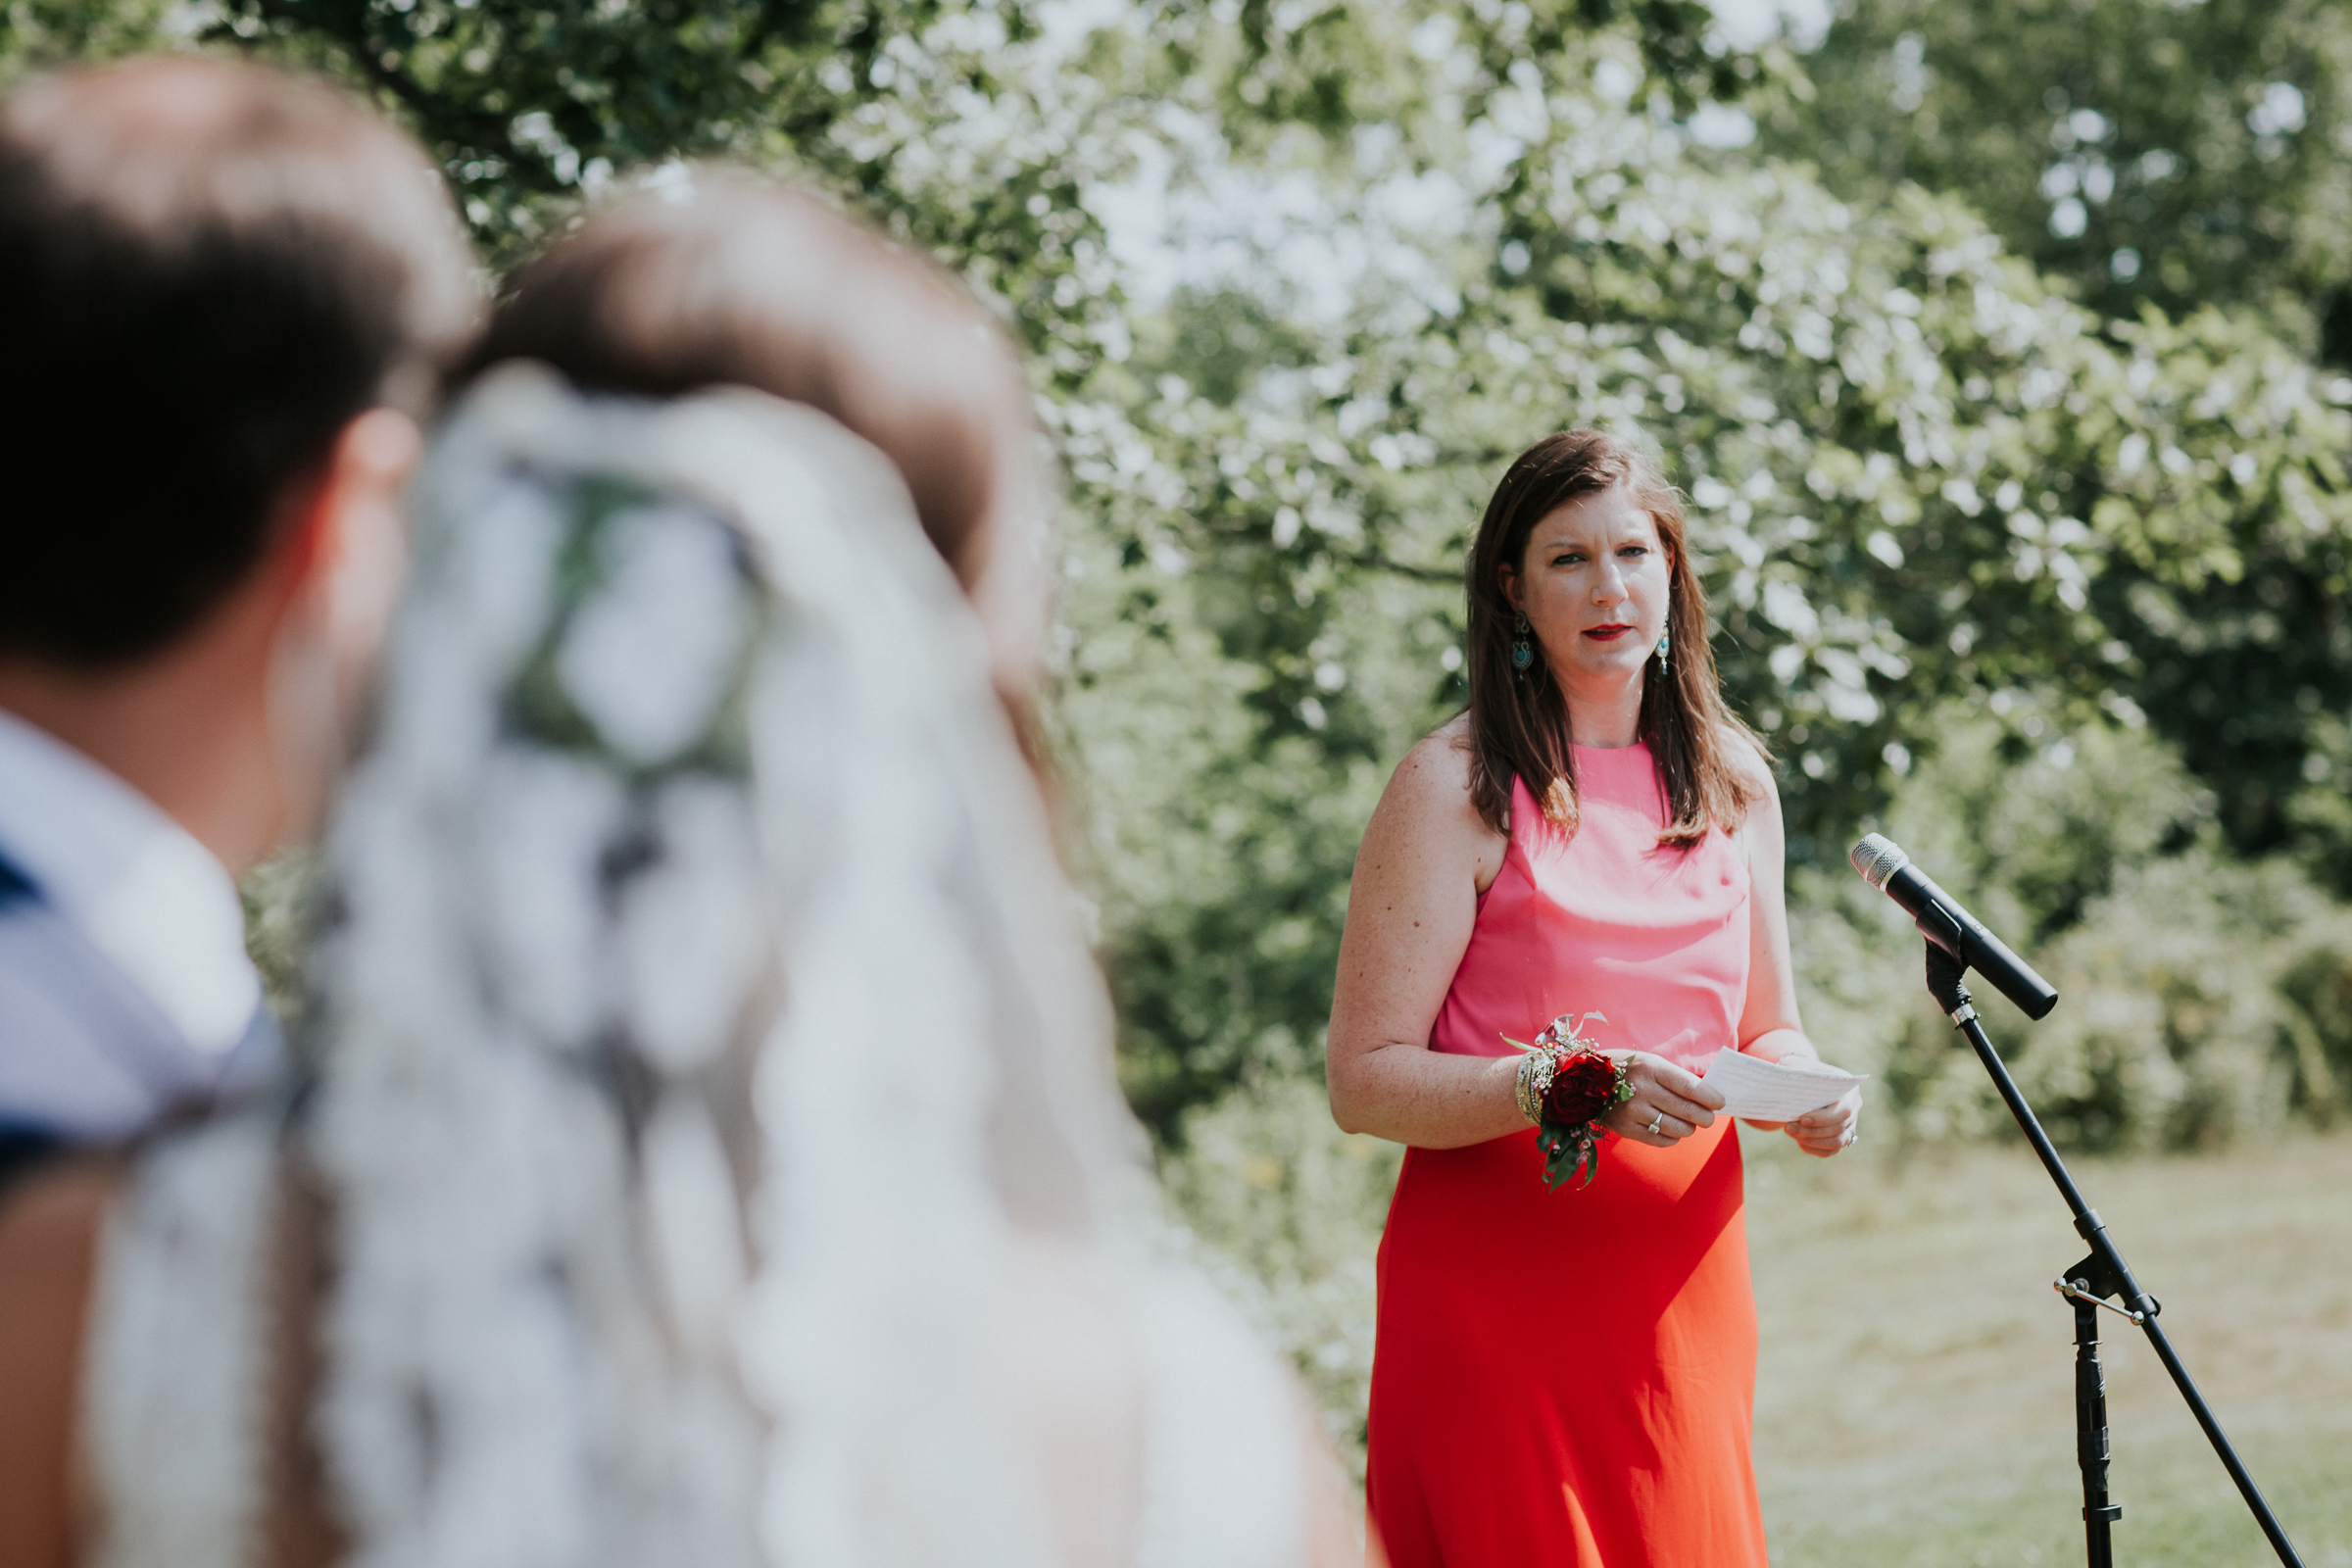 Marianmade-Farm-Wiscasset-Maine-Fine-Art-Documentary-Wedding-Photographer-Elvira-Kalviste-Photography-75.jpg